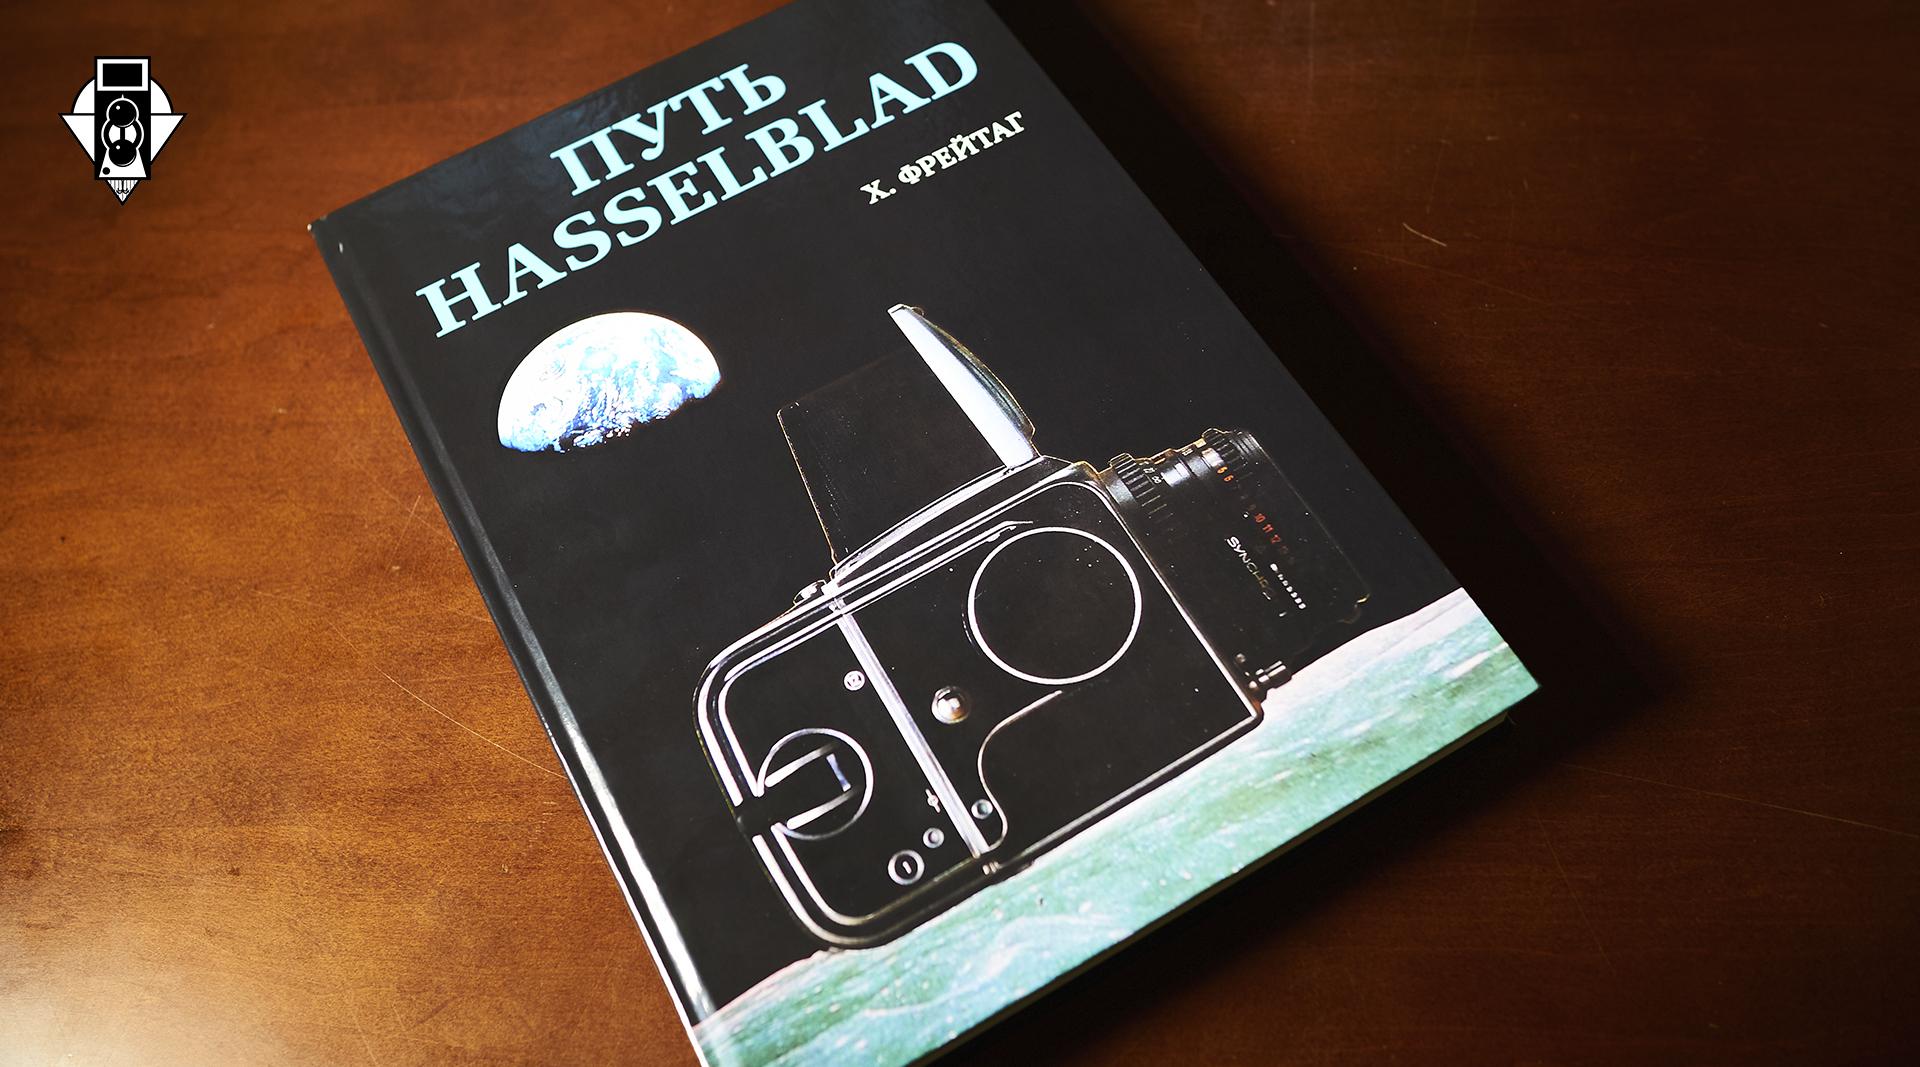 Книга «Путь Hasselblad» Х. Фрейтаг. 2021 г. (оригинал 1978 г.)